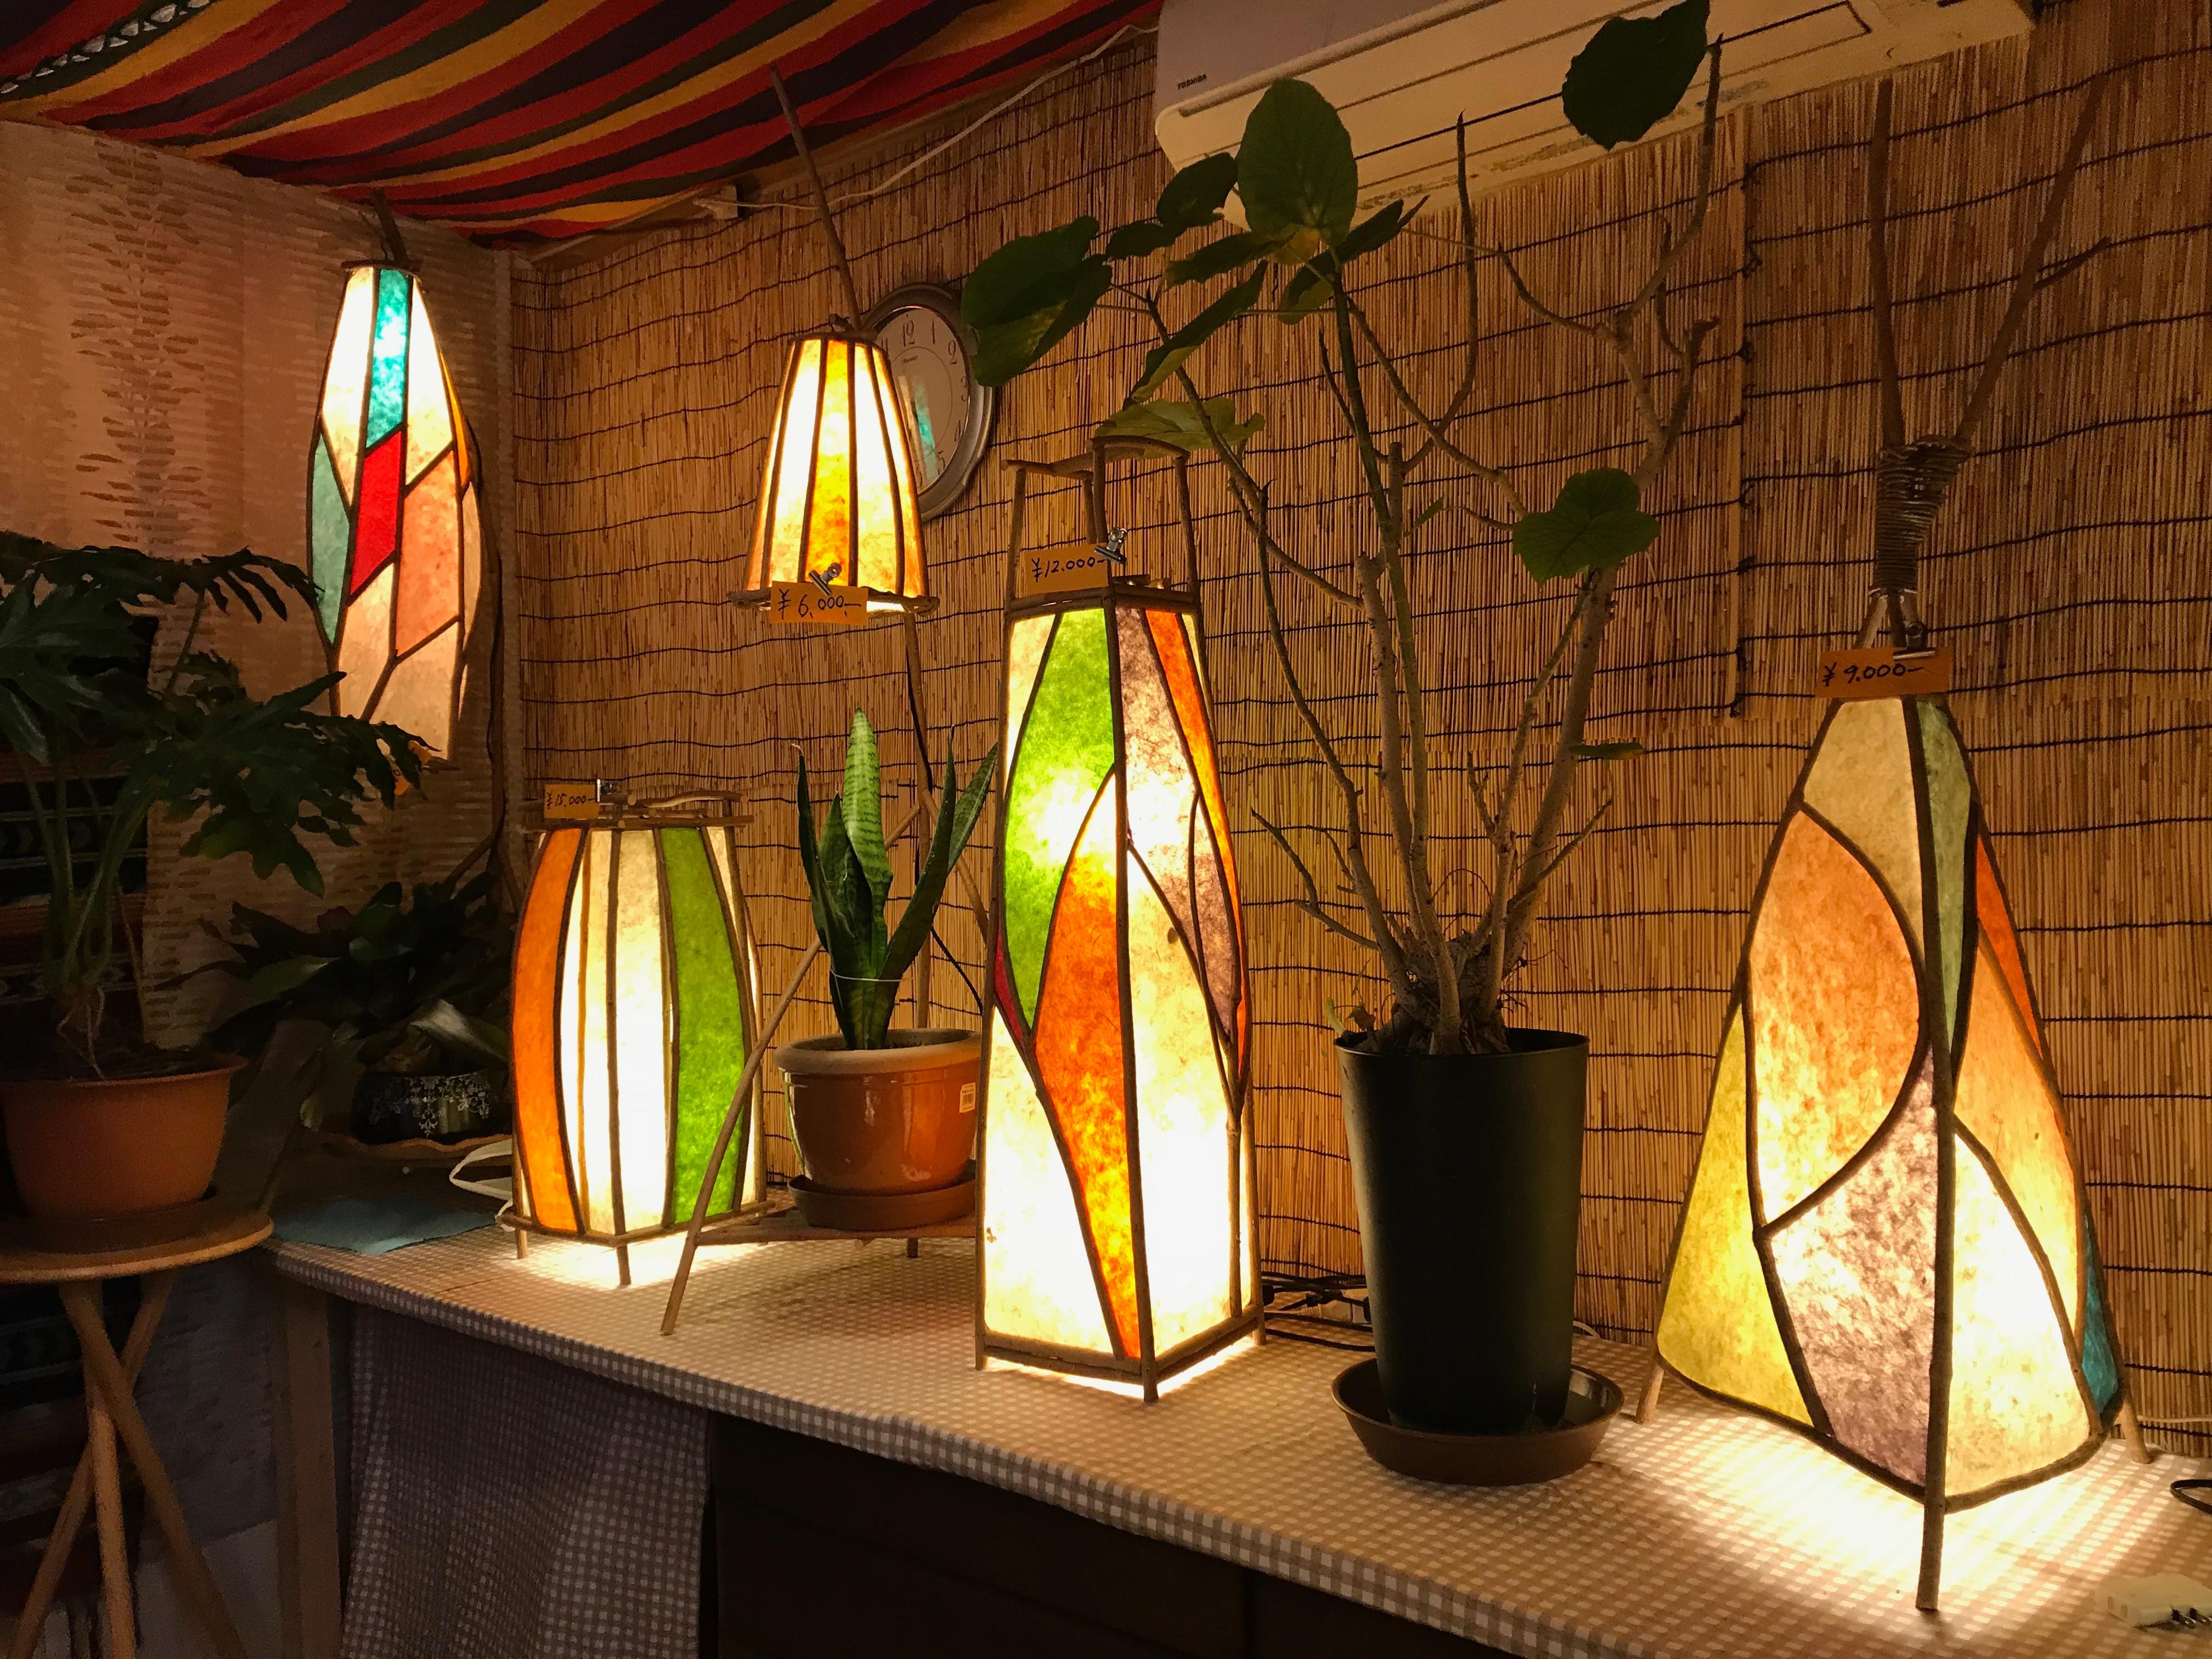 Japanese Lantern Workshop